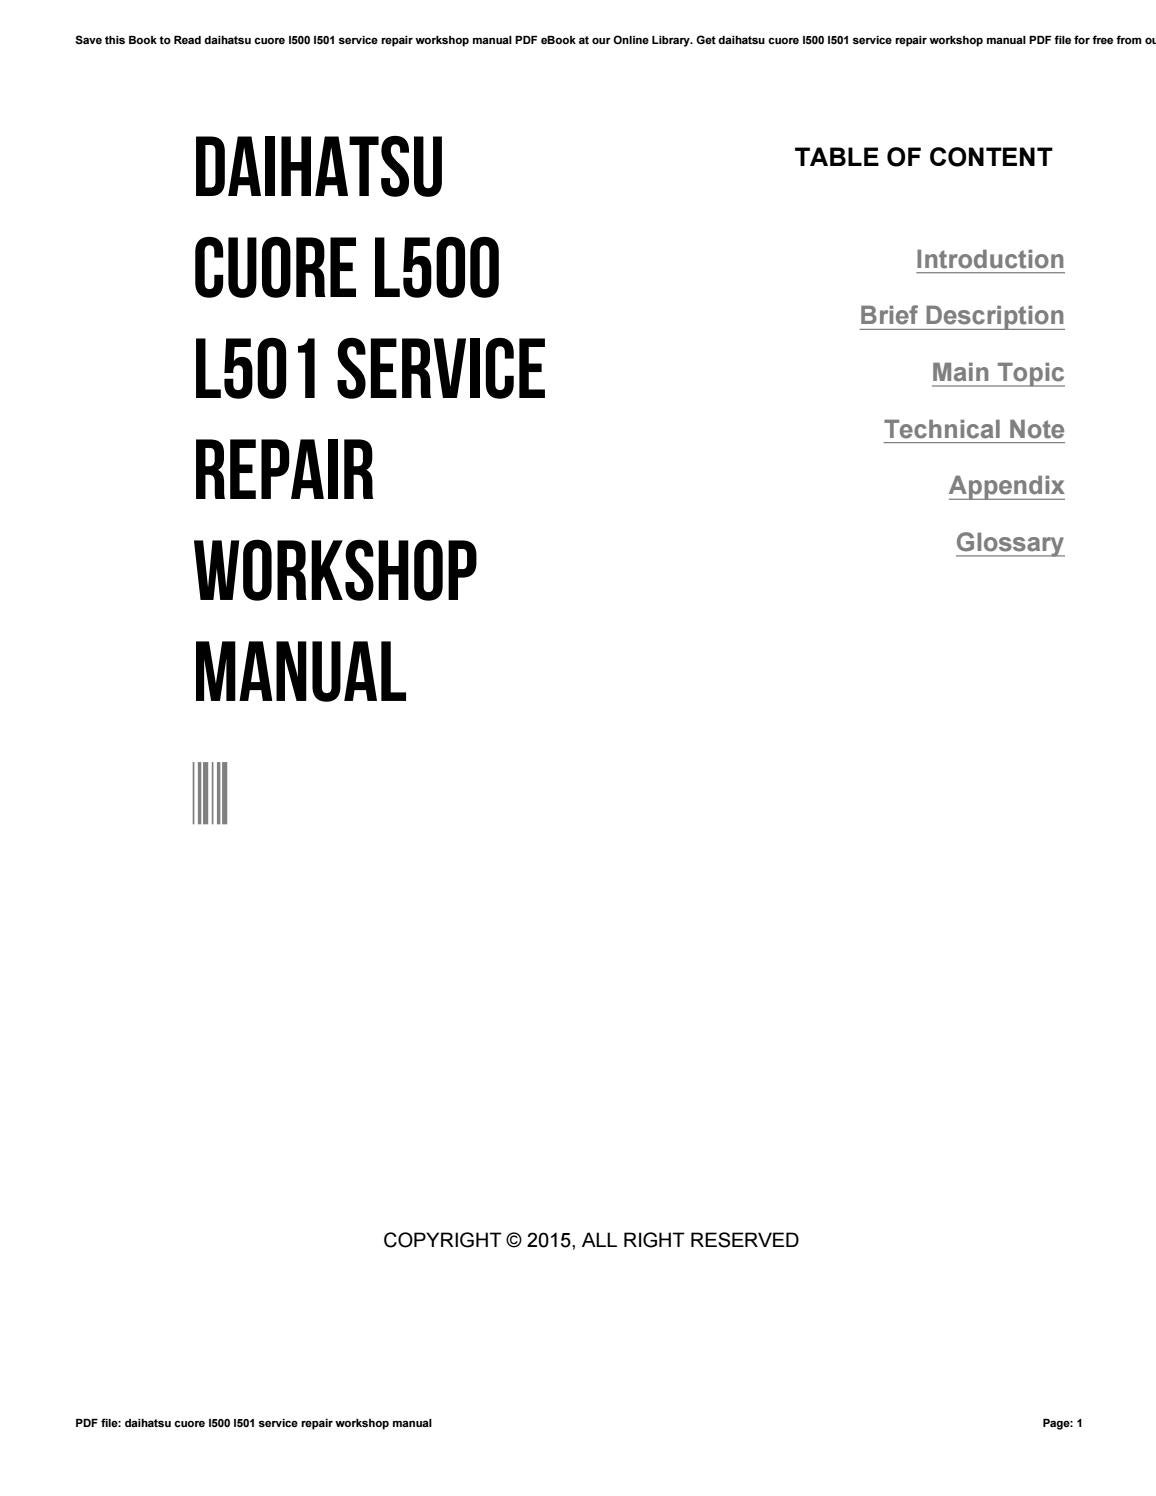 Daihatsu cuore l500 l501 service repair workshop manual by